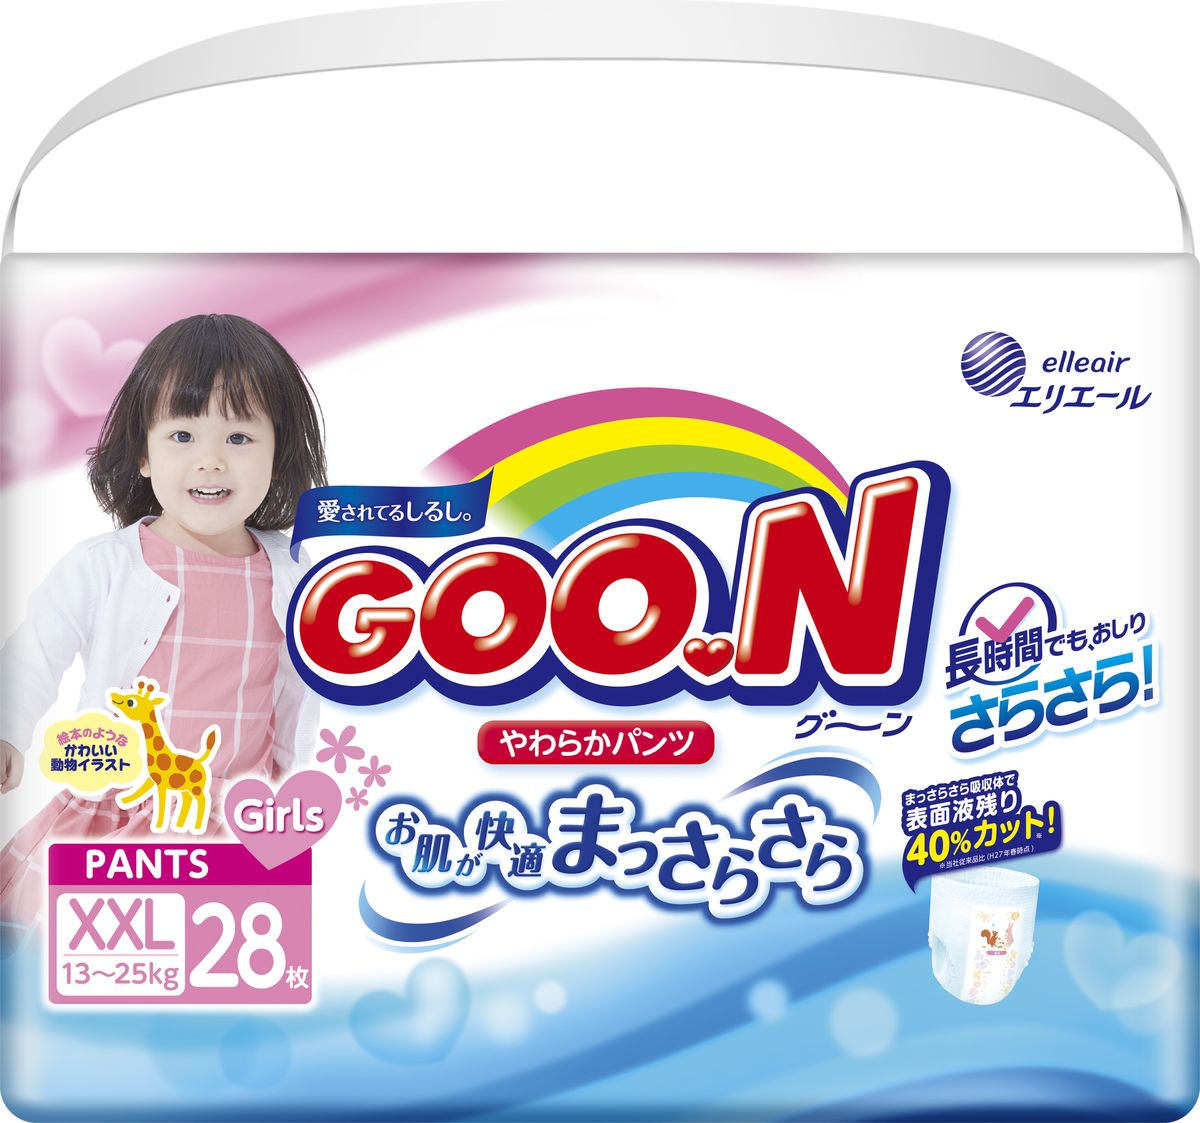 GOON Подгузники-трусики для девочек 13-25 кг, 28 шт goon трусики подгузники 13 25 кг 28 шт